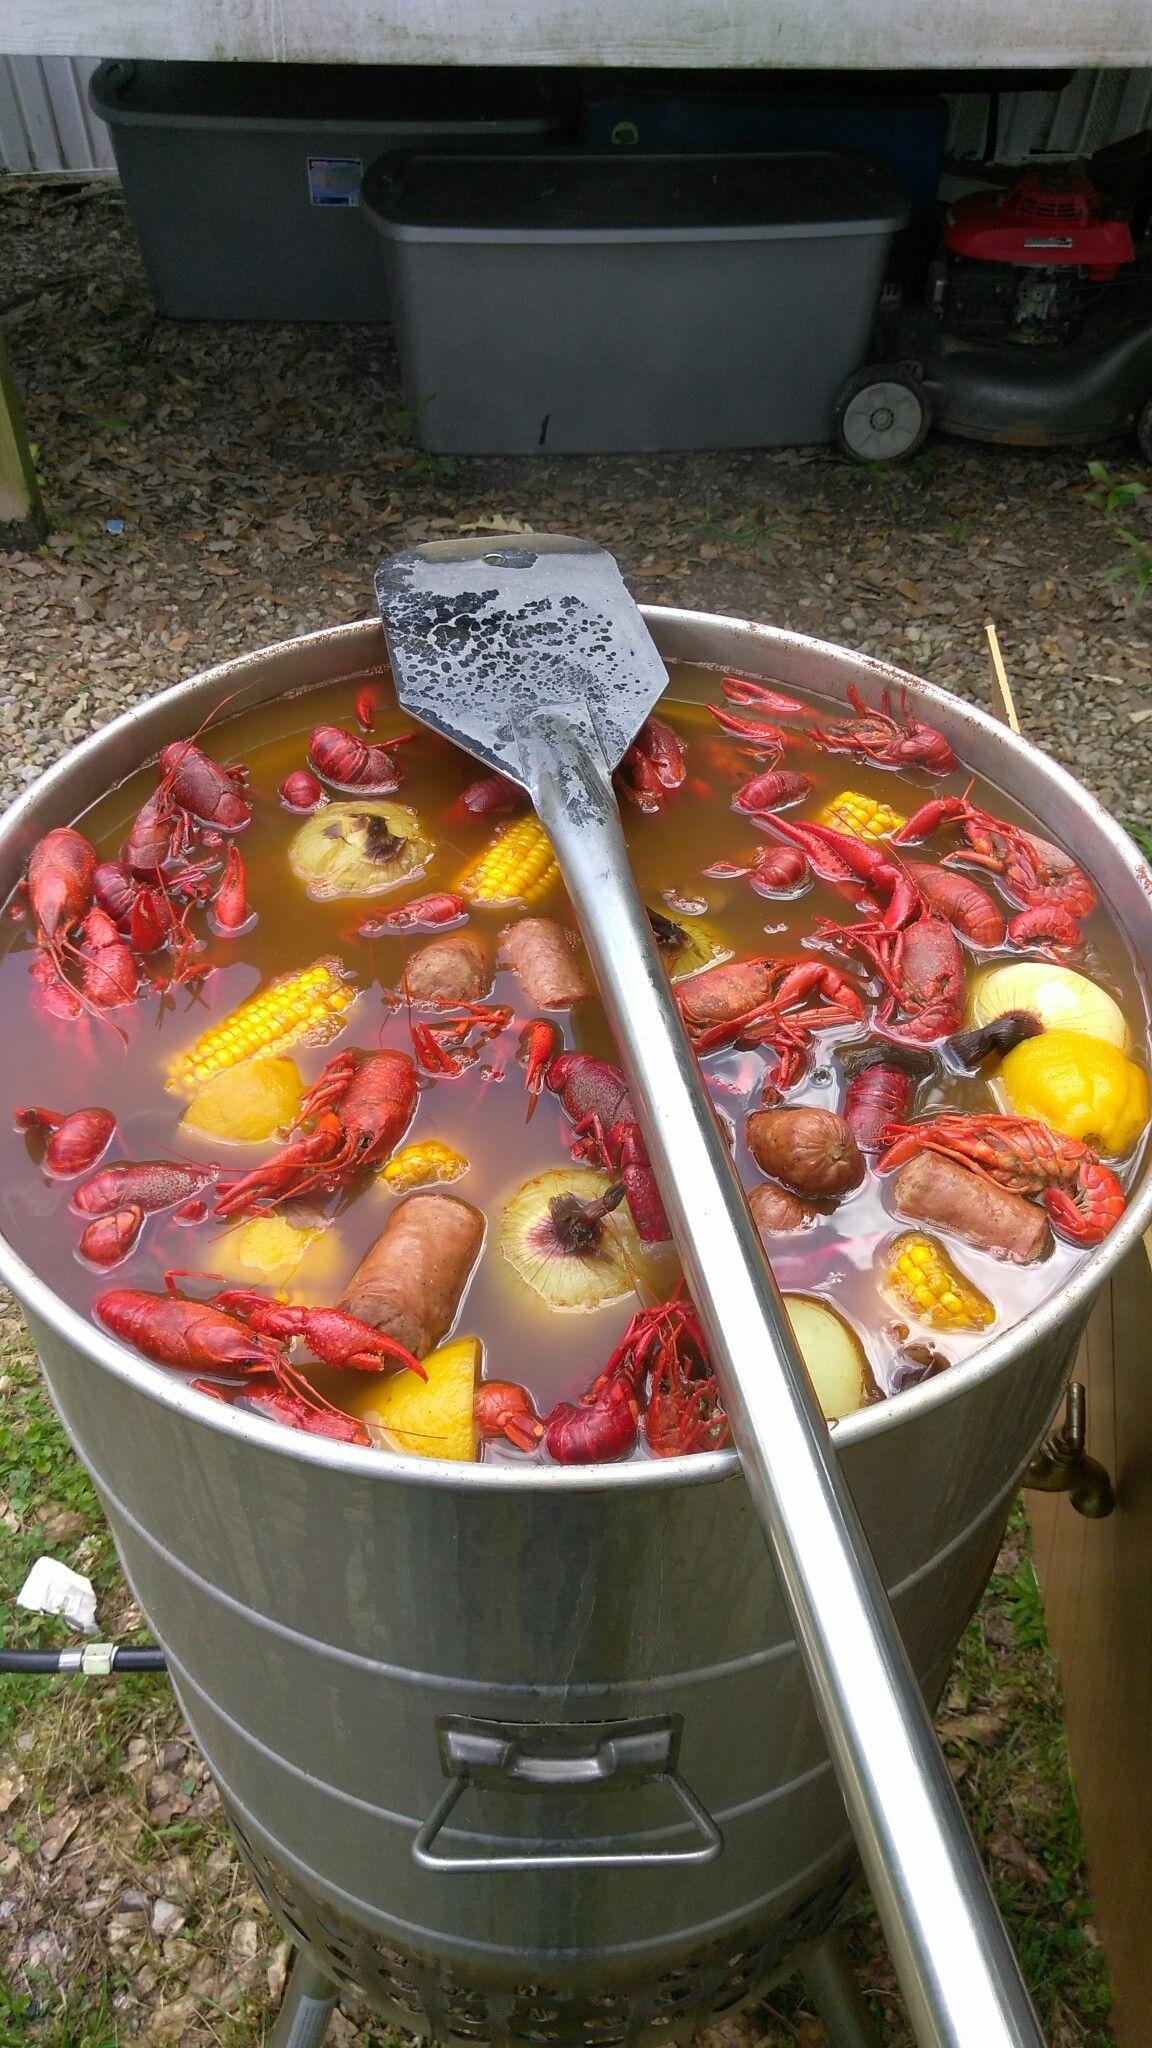 Crawfish boil crawfish boil crawfish good times